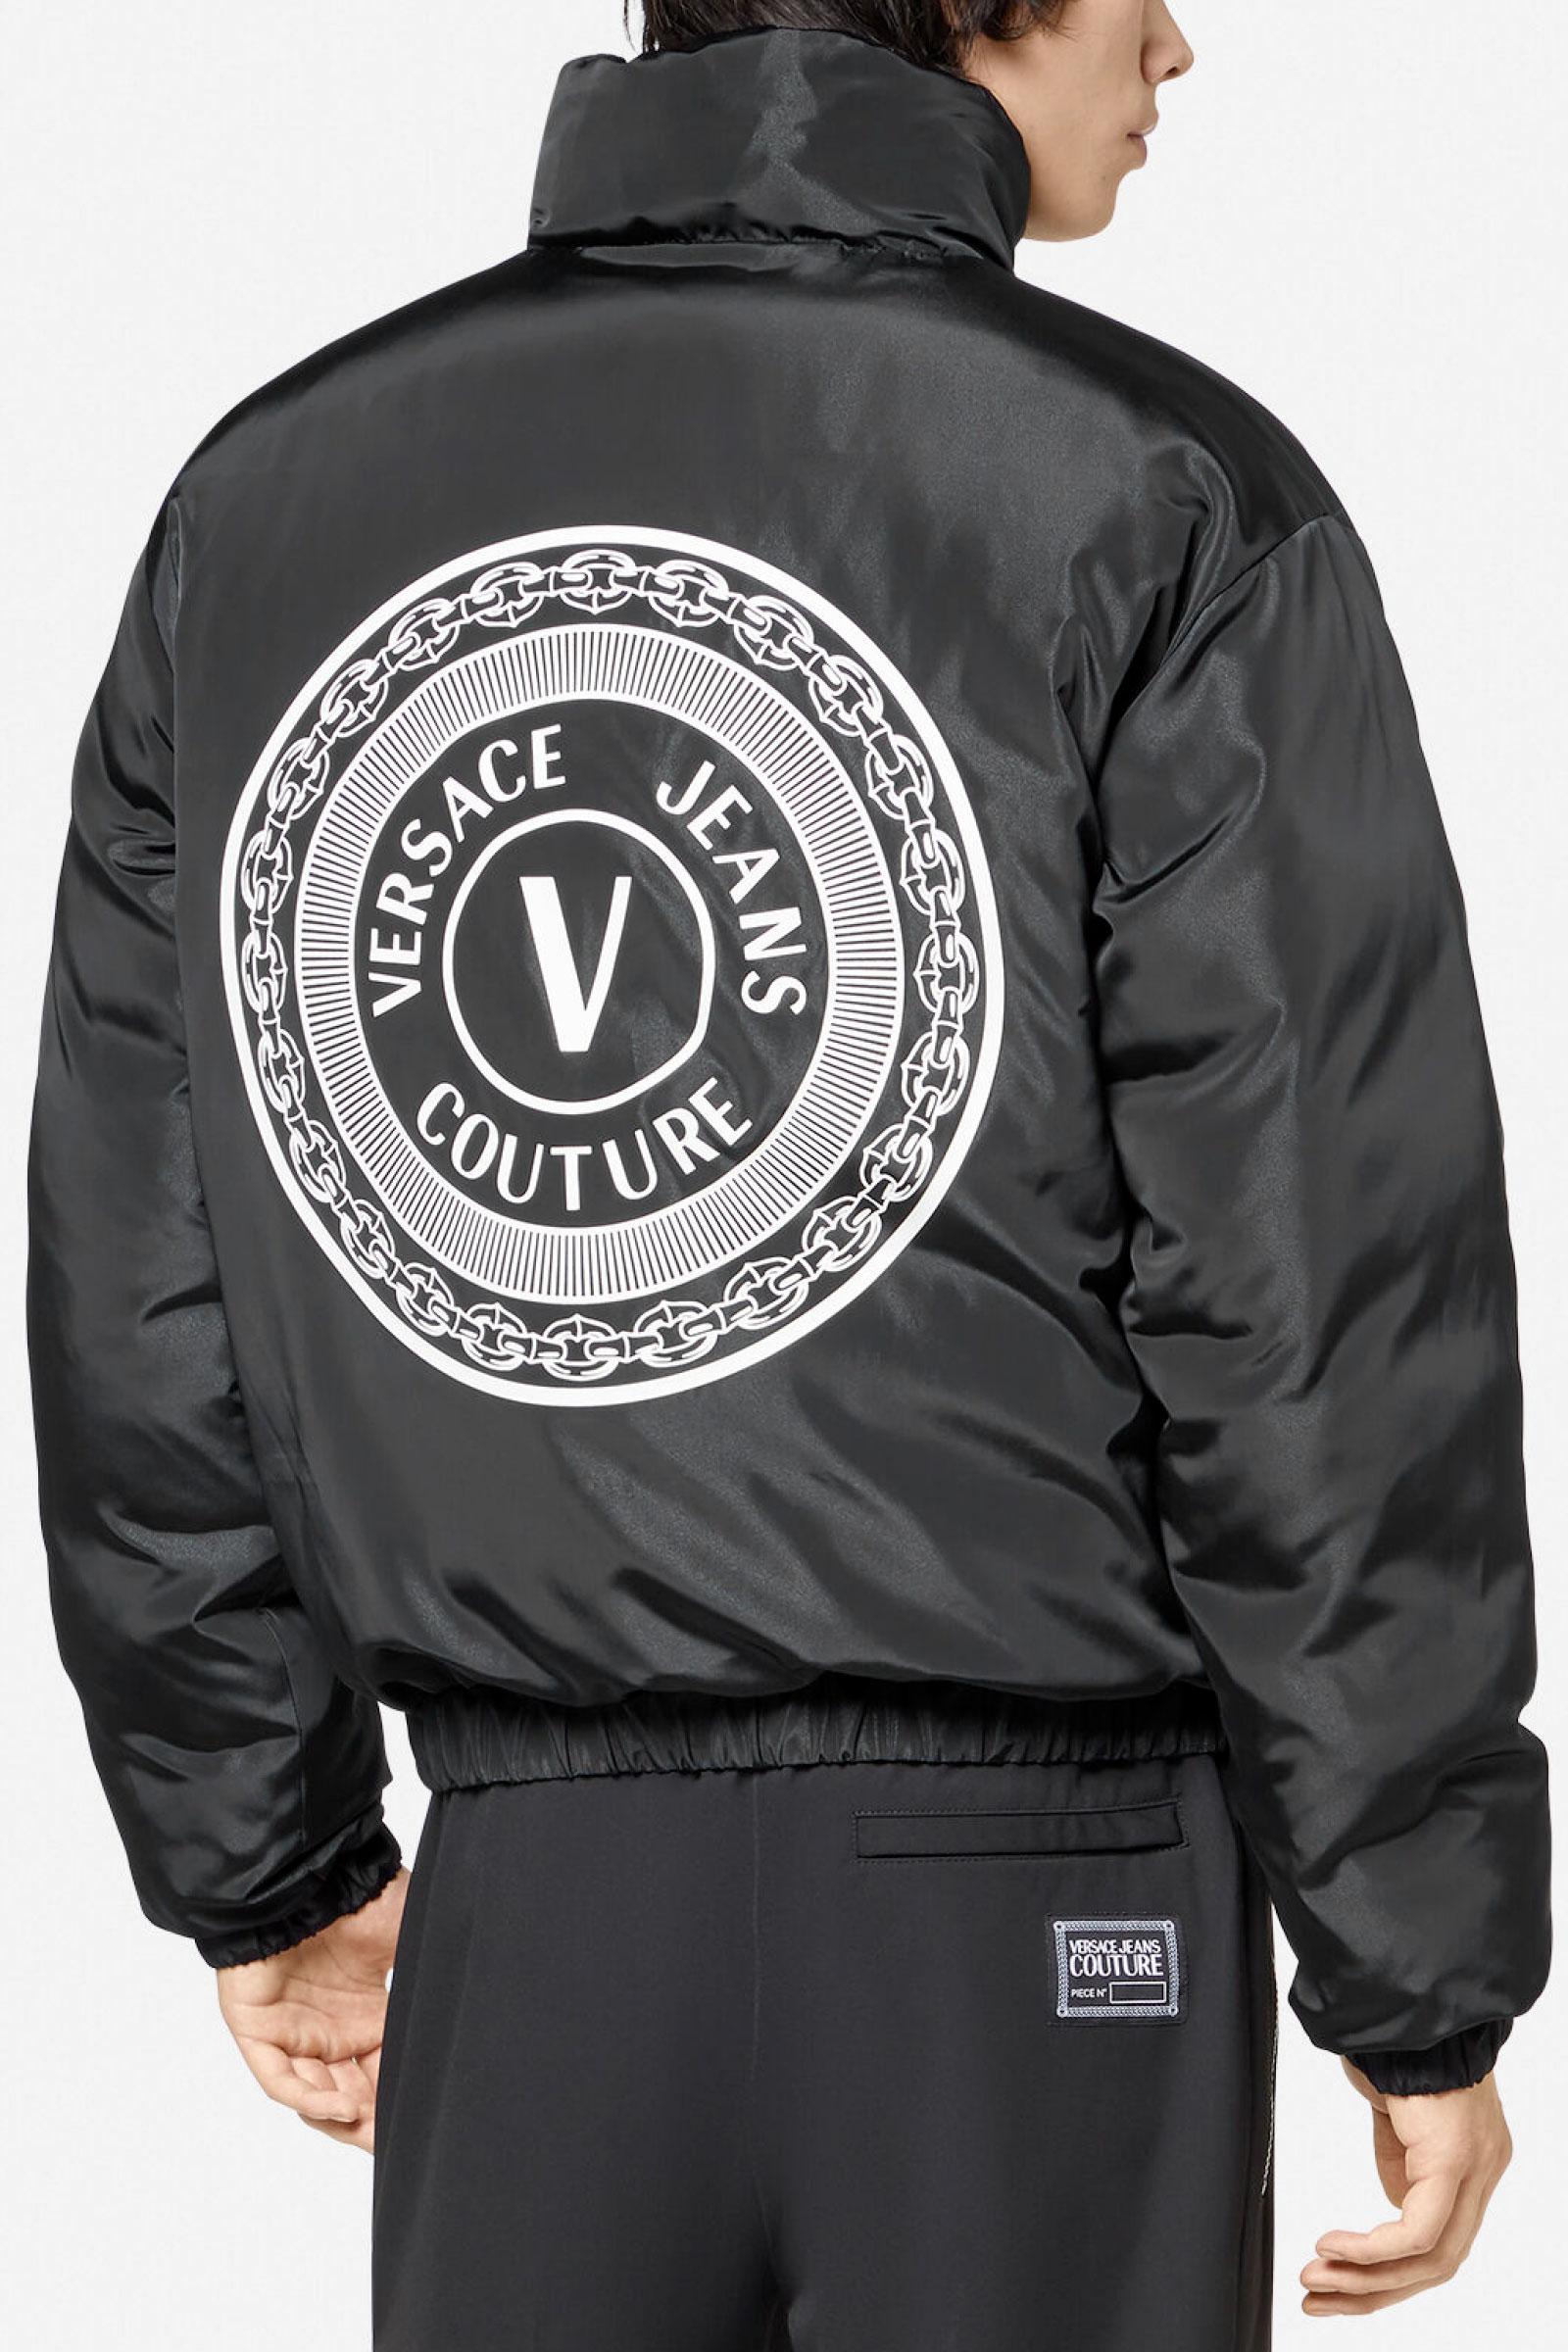 VERSACE JEANS COUTURE | Jacket | 71GAU404 CQS03899